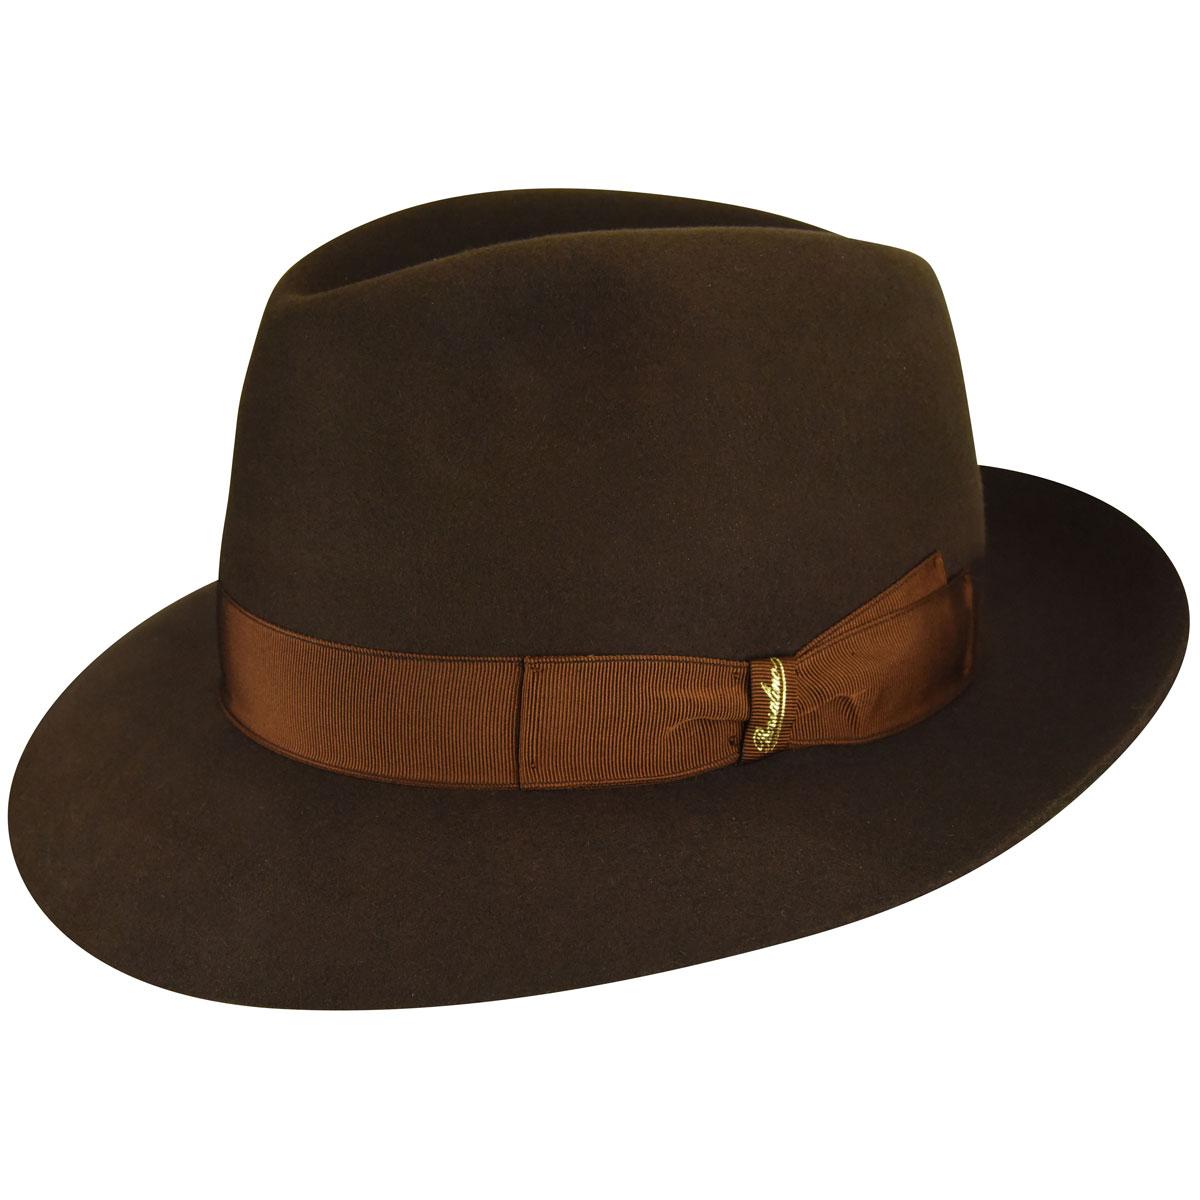 1940s Mens Hat Styles and History Novara Fedora $320.00 AT vintagedancer.com